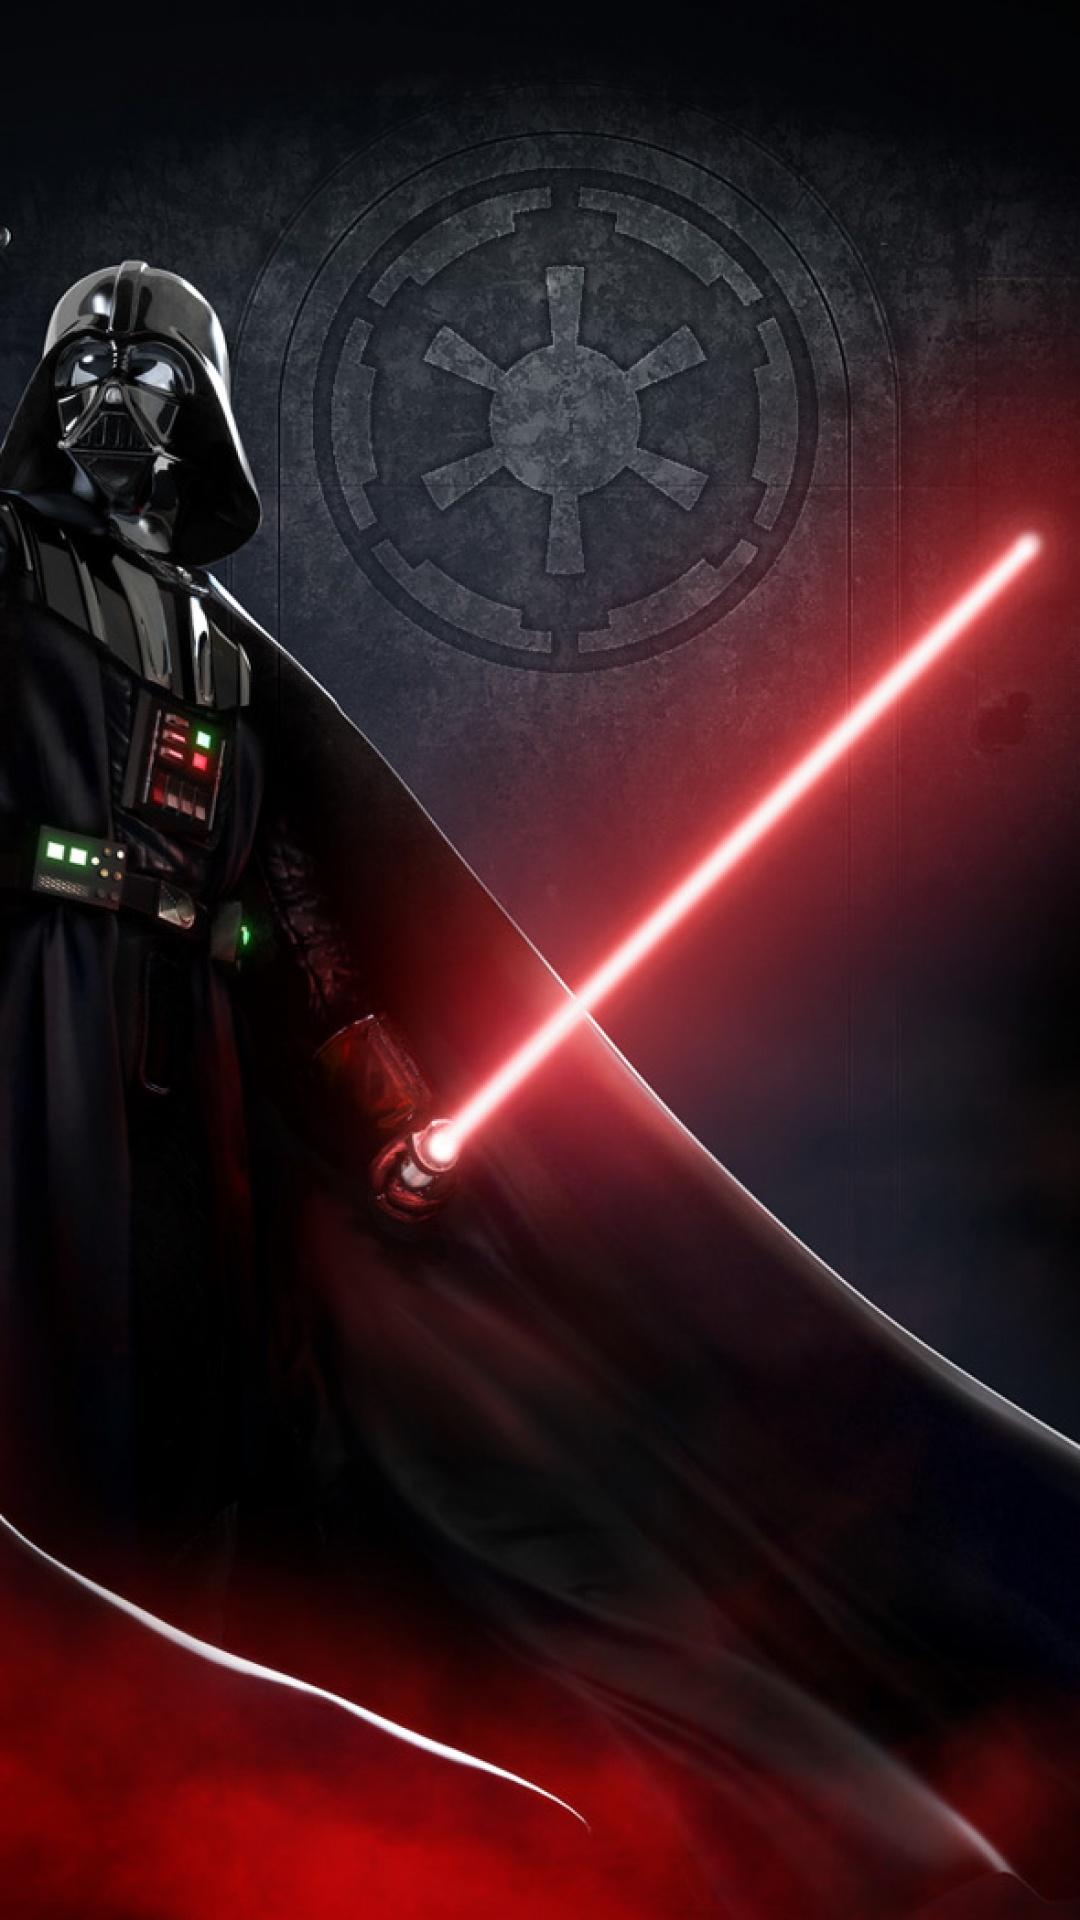 Darth Vader Star Wars Iphone Wallpapers